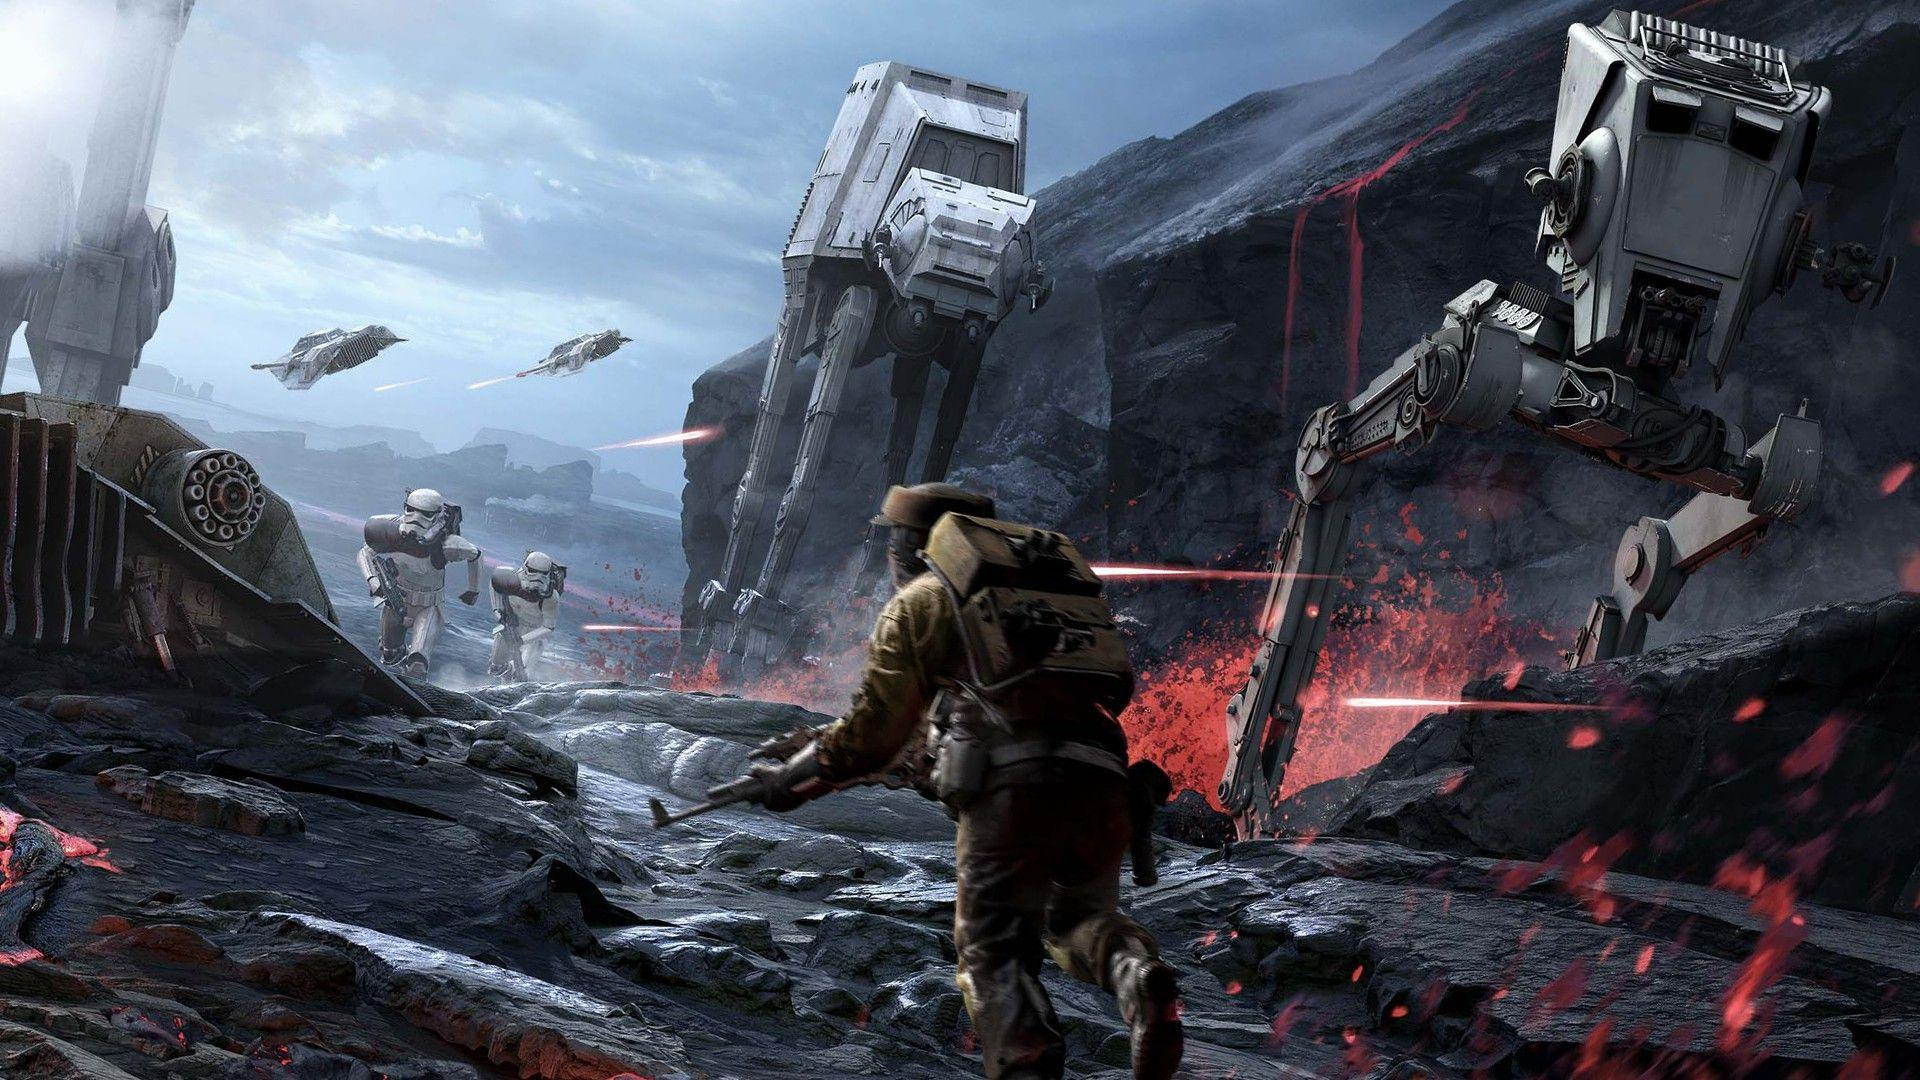 Star Wars Battlefront Wallpapers Wallpaper Cave